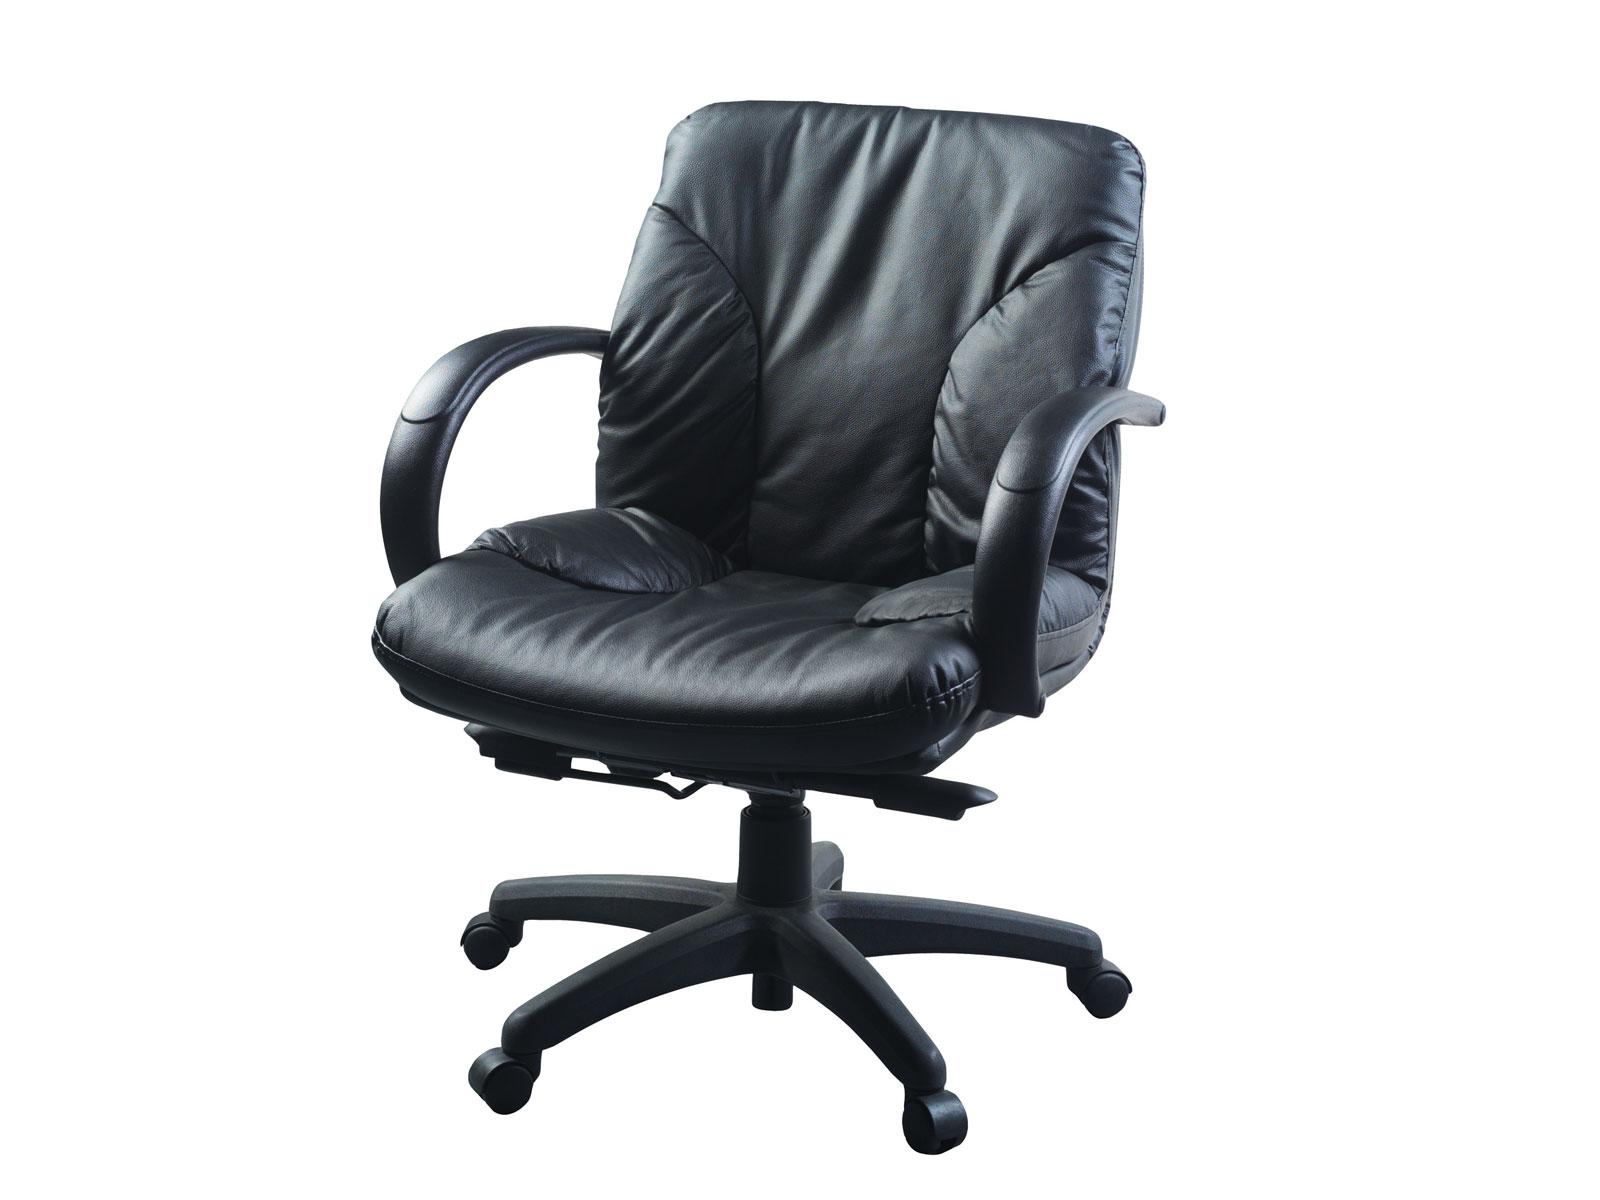 exhibit design search ceoc 007 office chair black